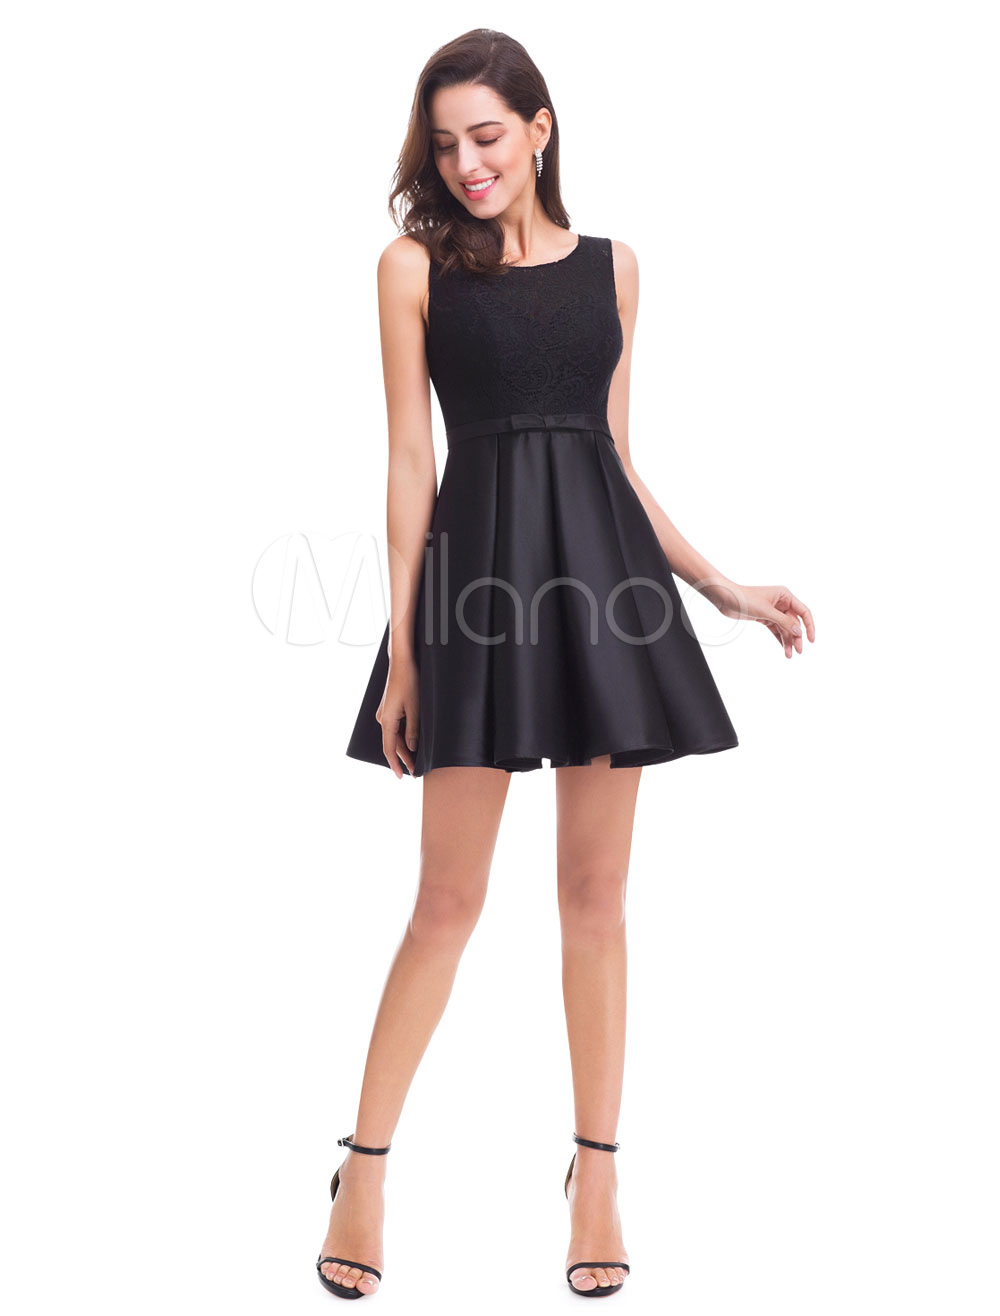 Little Black Dresses A Line Short Homecoming Dress Lace Bow Sash Pleated Mini Cocktail Dress